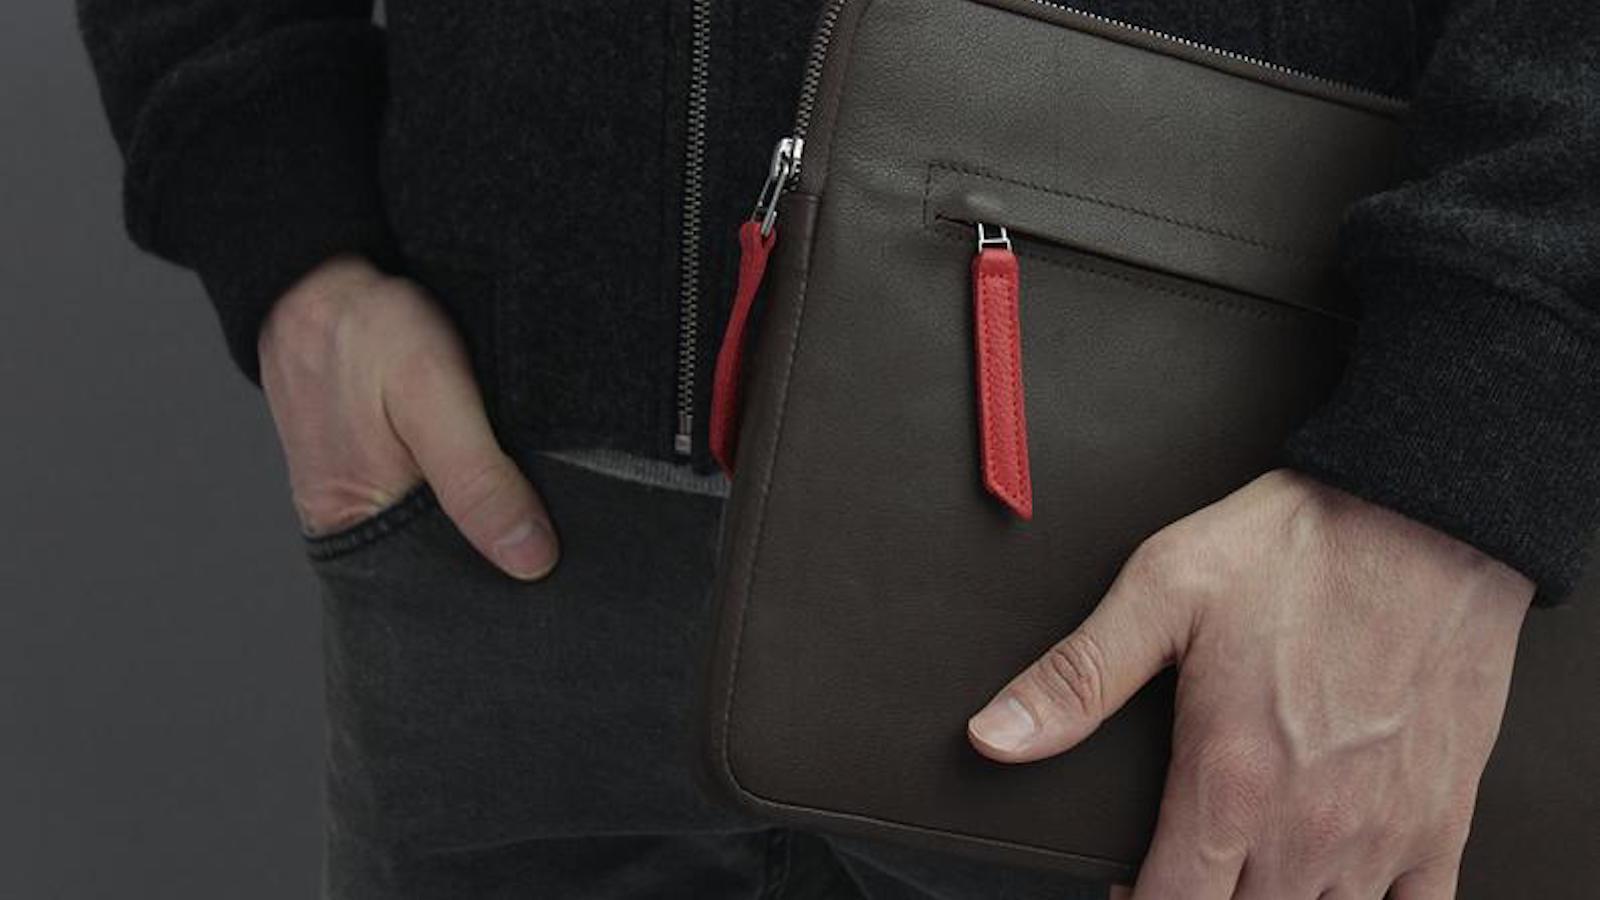 Pack & Smooch Smart Keyboard Folio Case iPad Pro Leather Sleeve